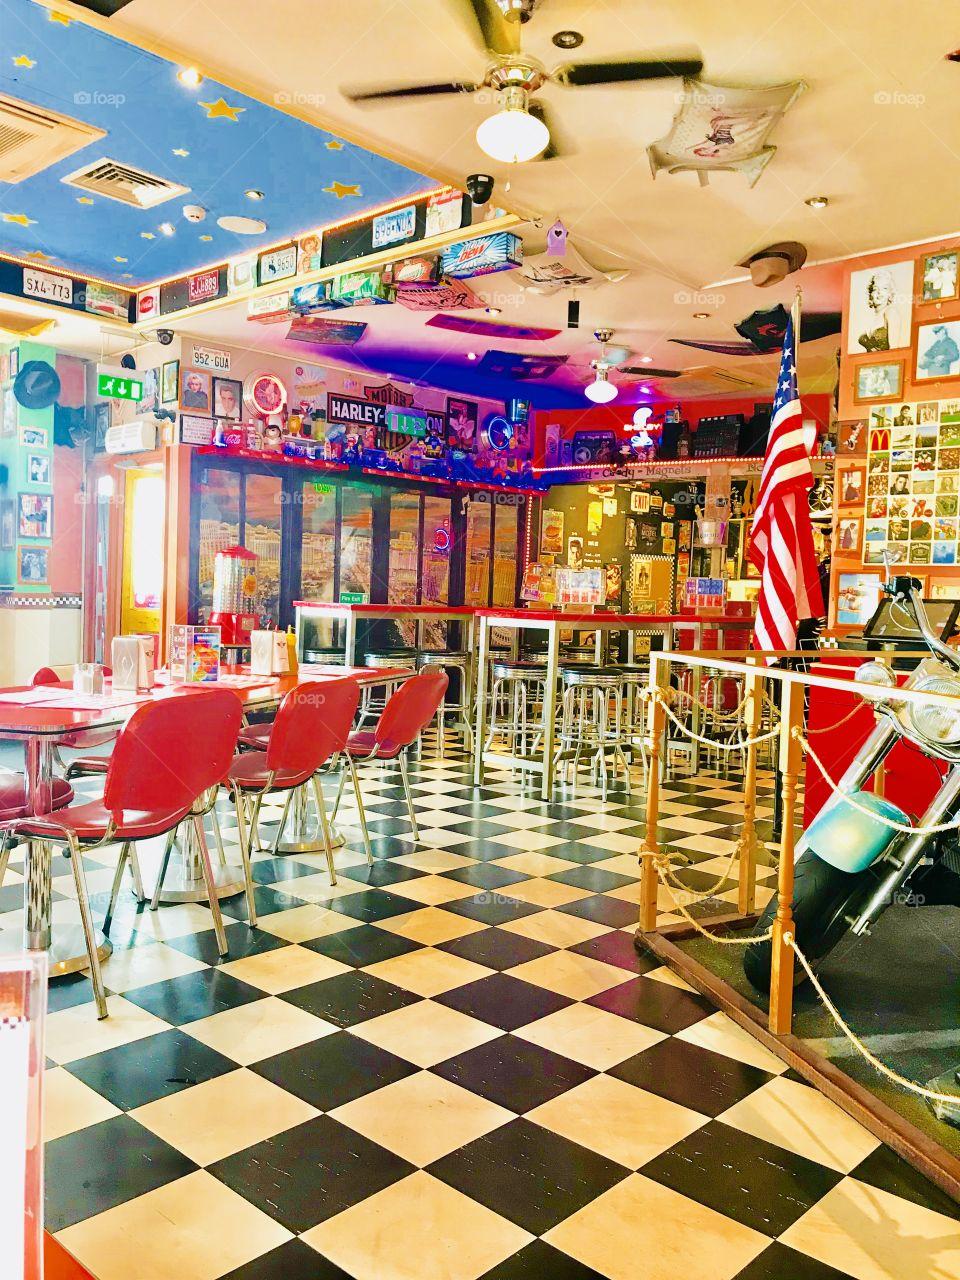 American Diner in Brighton 1950s America style grease United States retro USA vintage